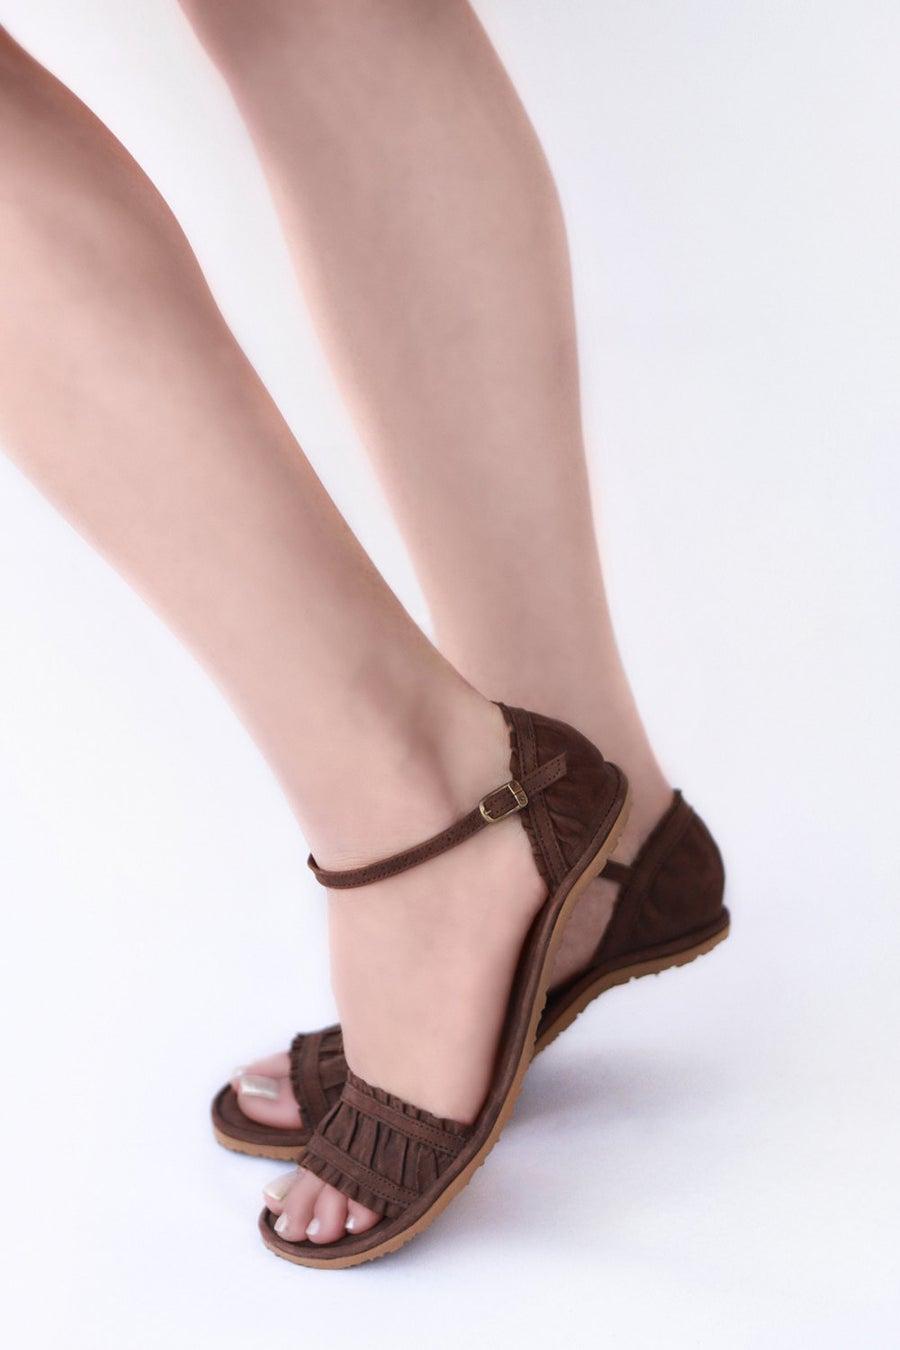 Image of Sandals - Furbelow